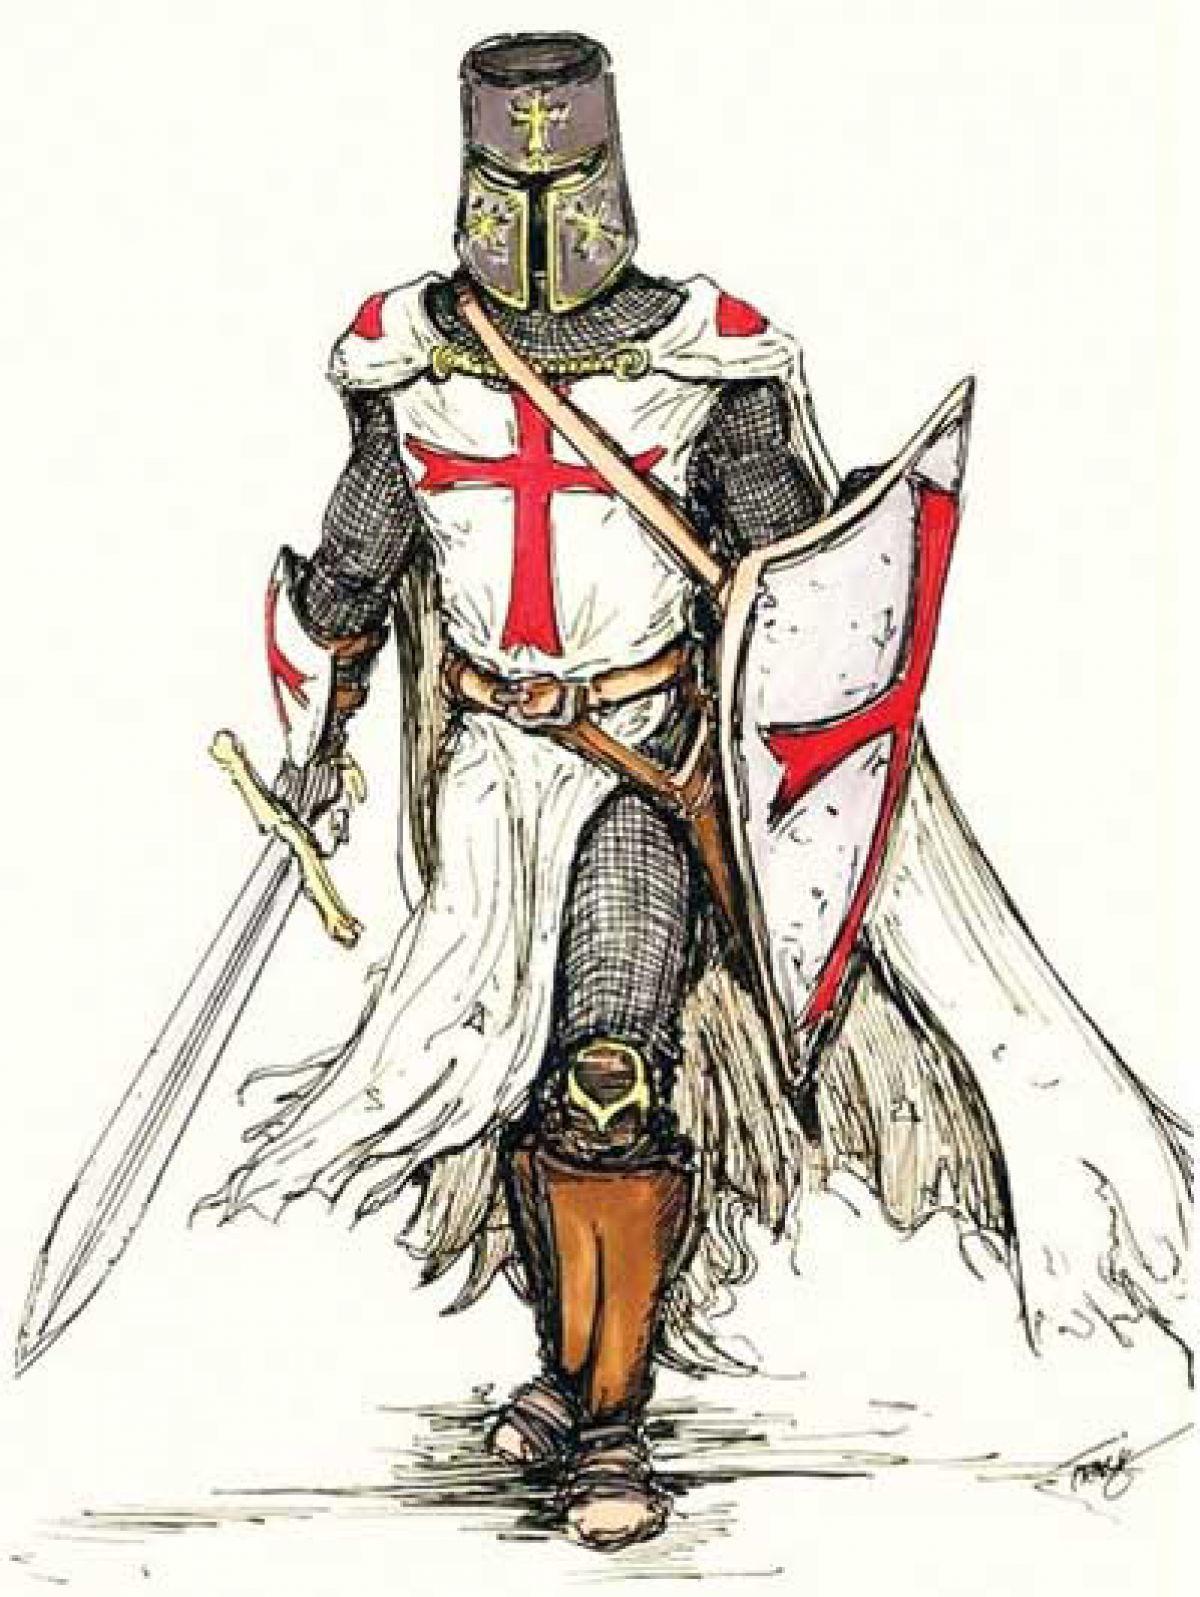 Pin de pete meadows smith em spartan tattoo pinterest guerreiros pin de pete meadows smith em spartan tattoo pinterest guerreiros de deus cavaleiros e deus vult fandeluxe Image collections